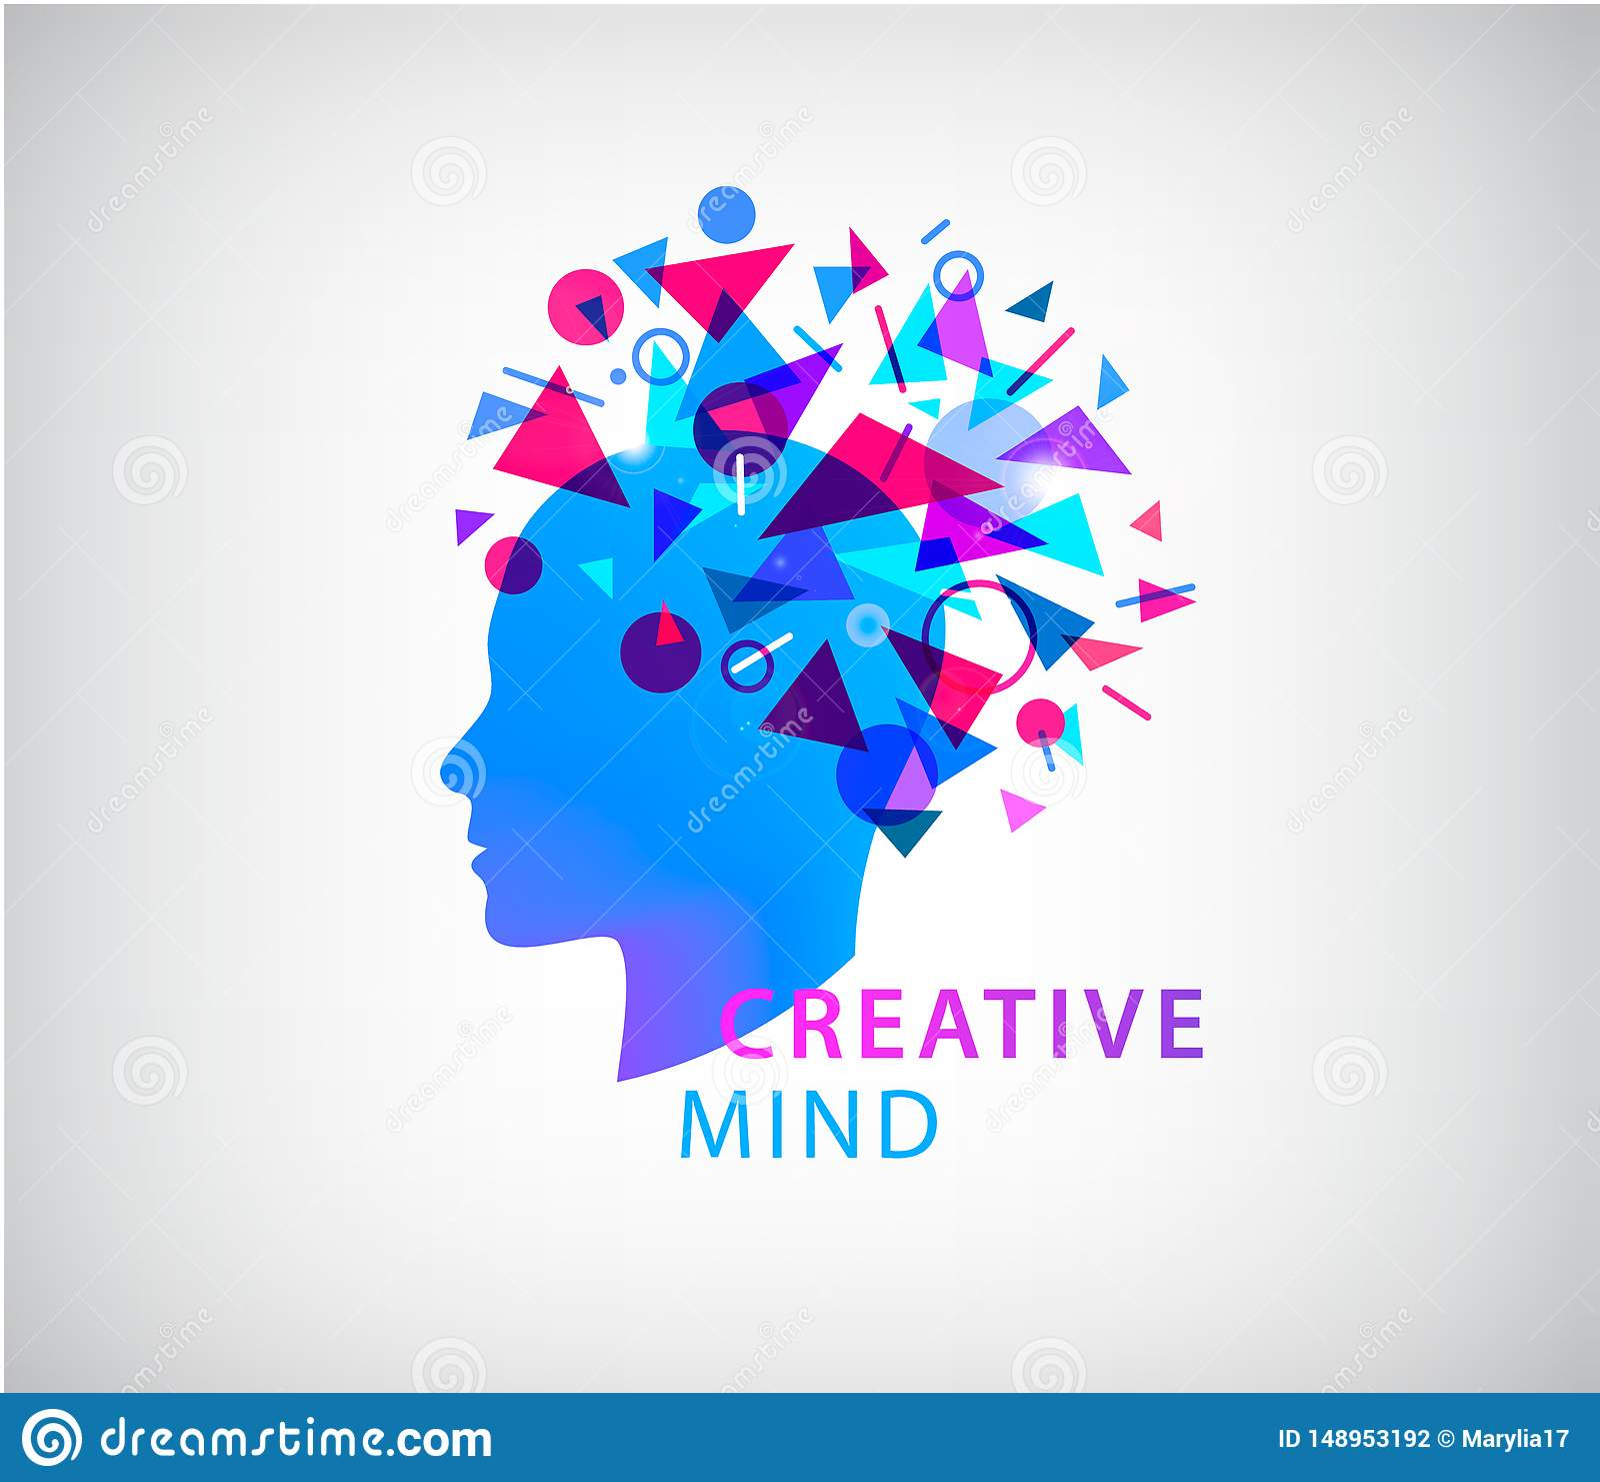 Vector creative mind, human head logo concept illustration. Learning icon. Innovation technology symbol. Digital modern